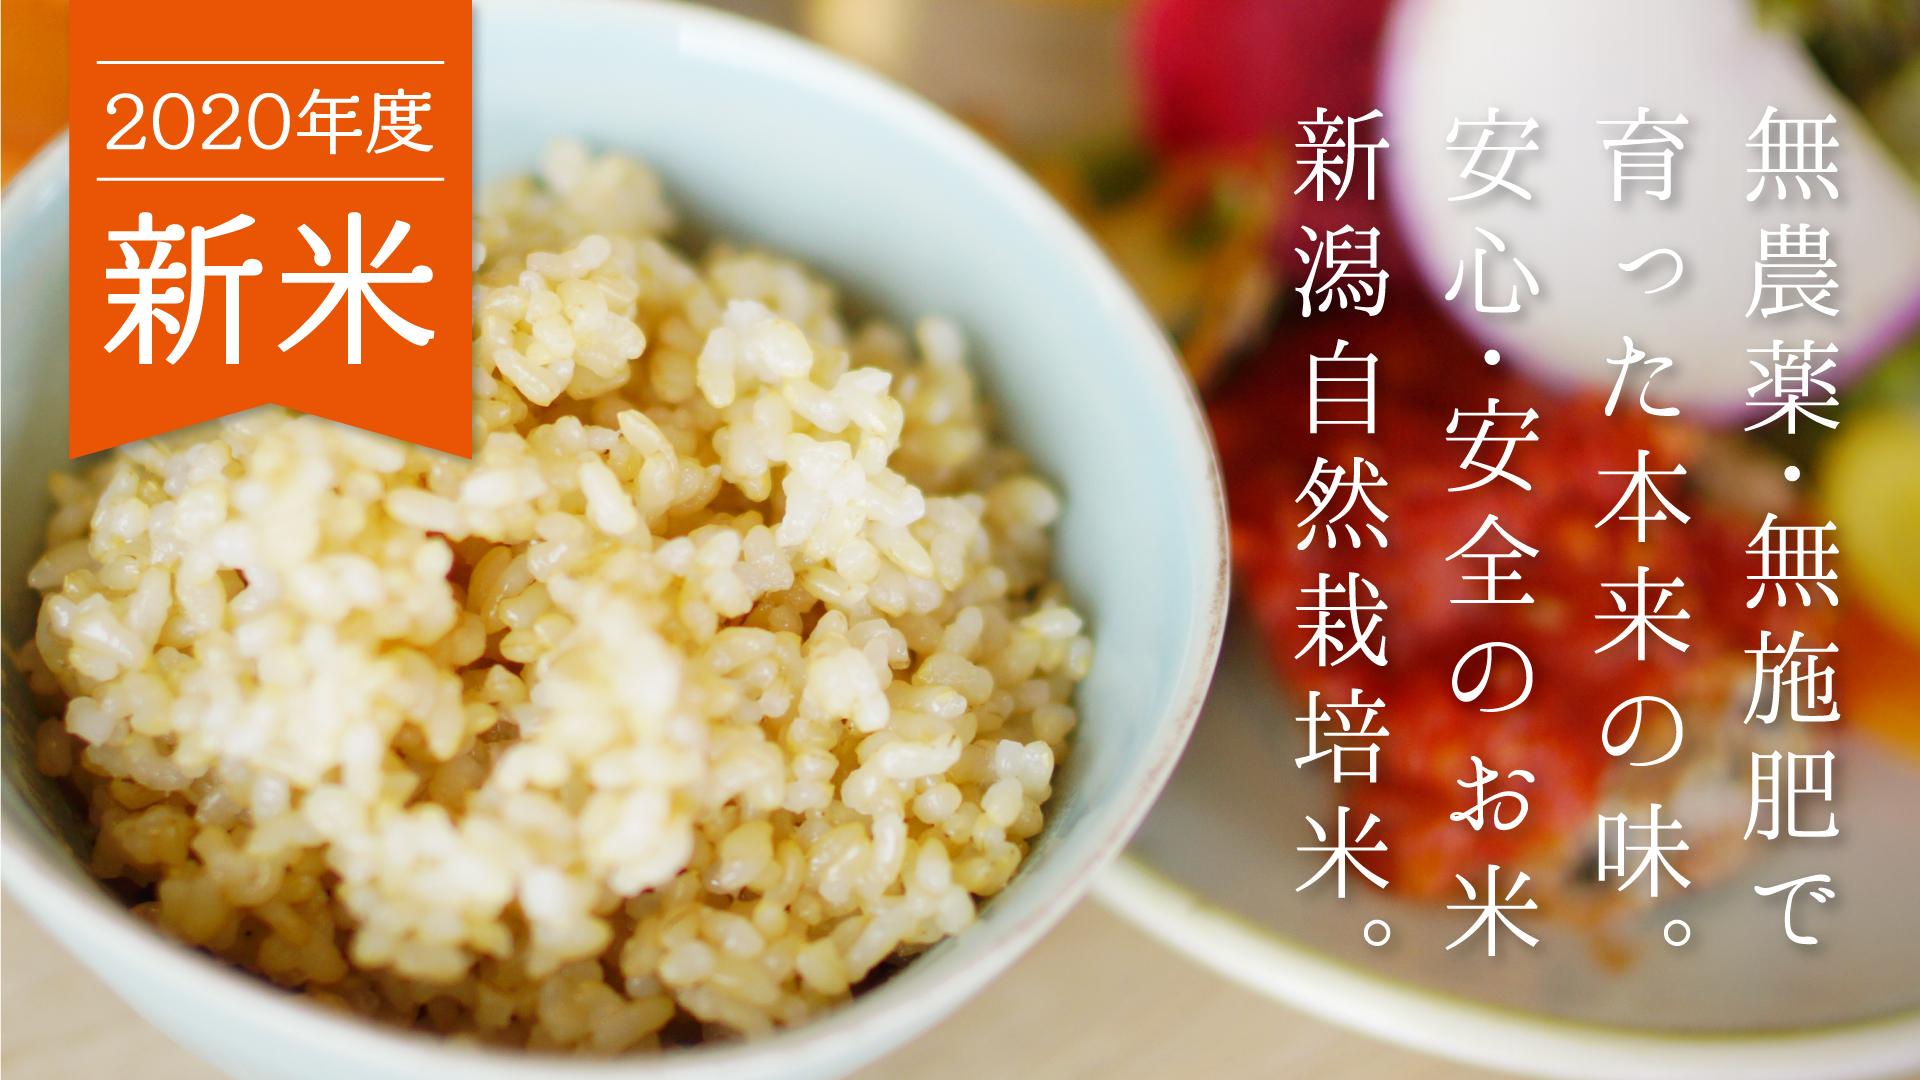 安心安全の新潟自然栽培米